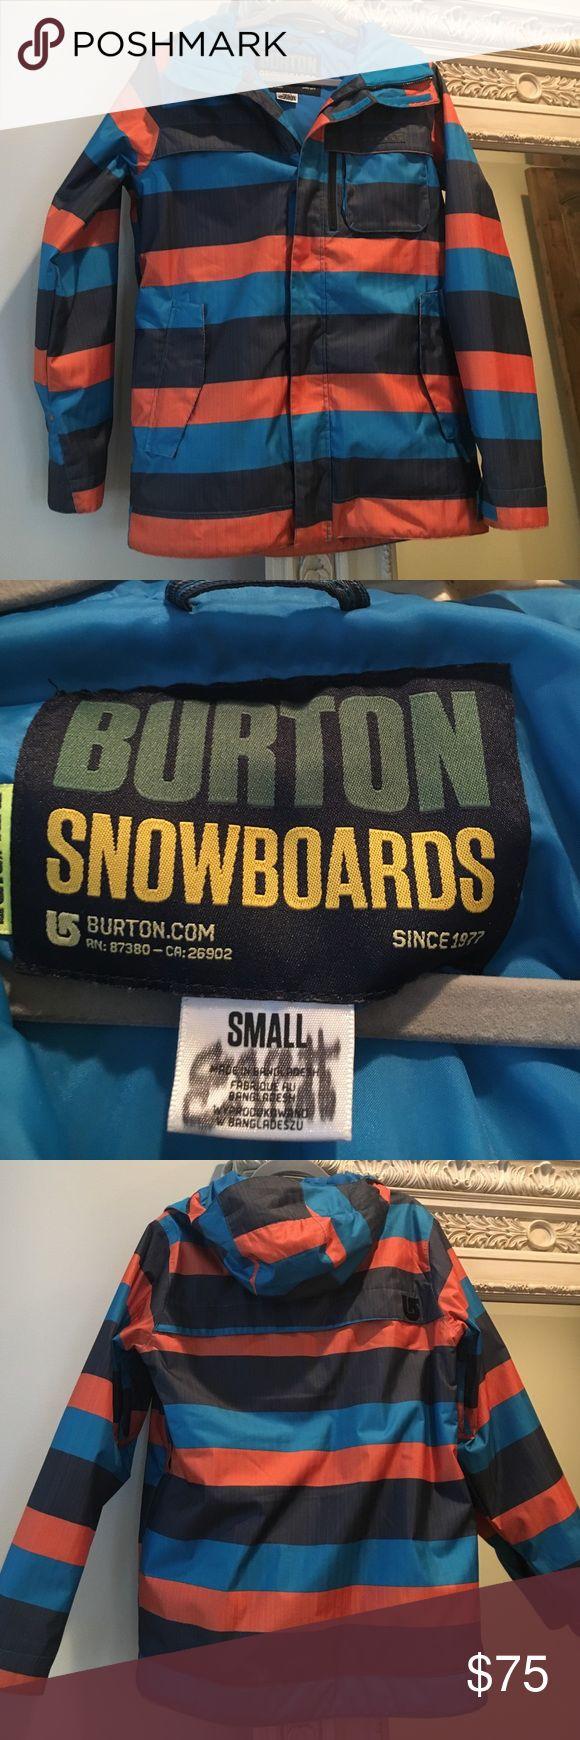 Men's lightweight Burton Ski Jacket Excellent condition. No rips, tears or signs of wear. Burton Jackets & Coats